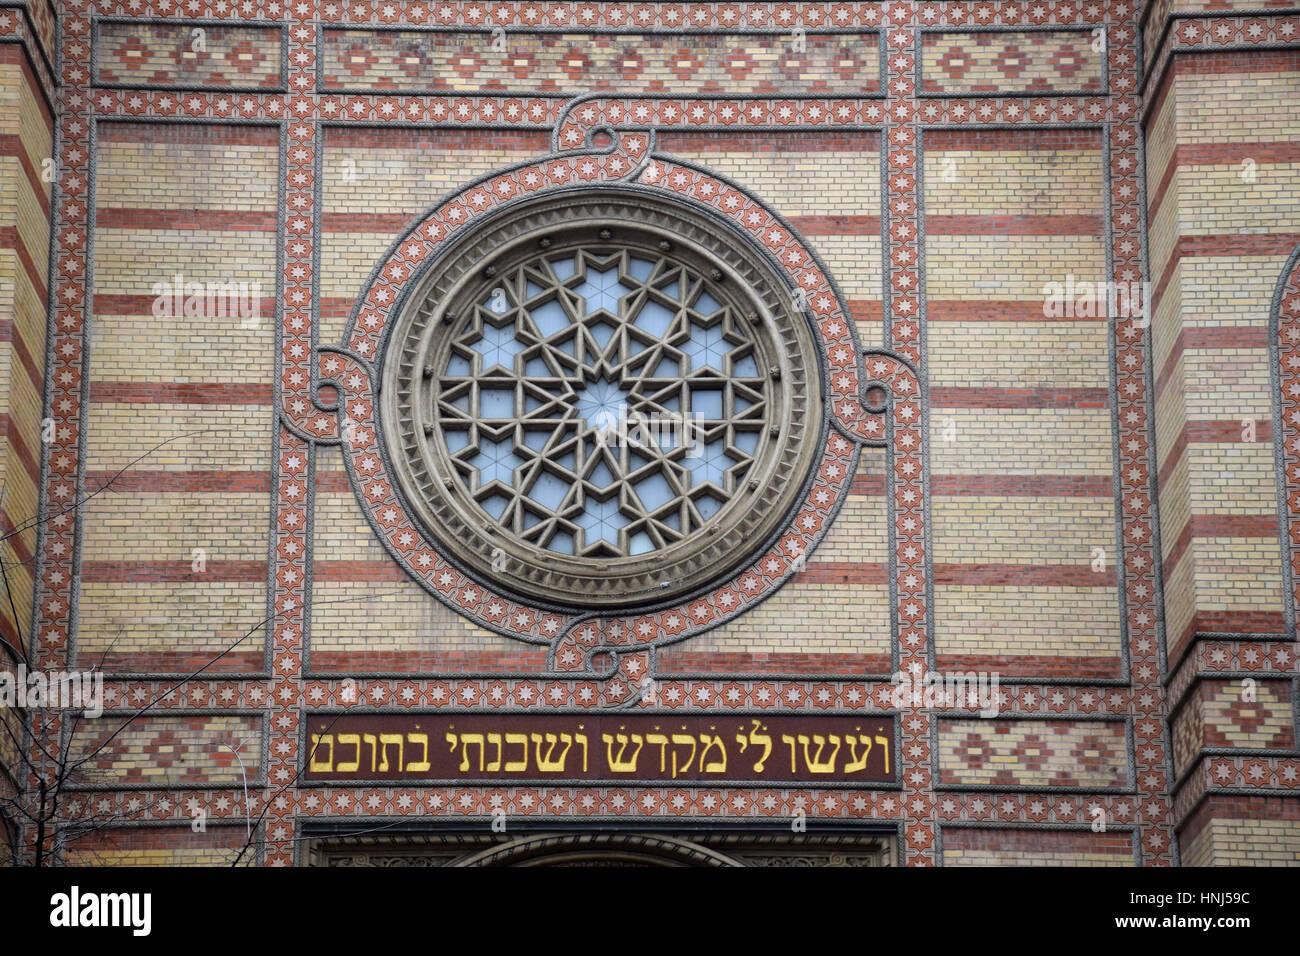 Budapest Grand Synagogue, Budapest, Hungary. - Stock Image